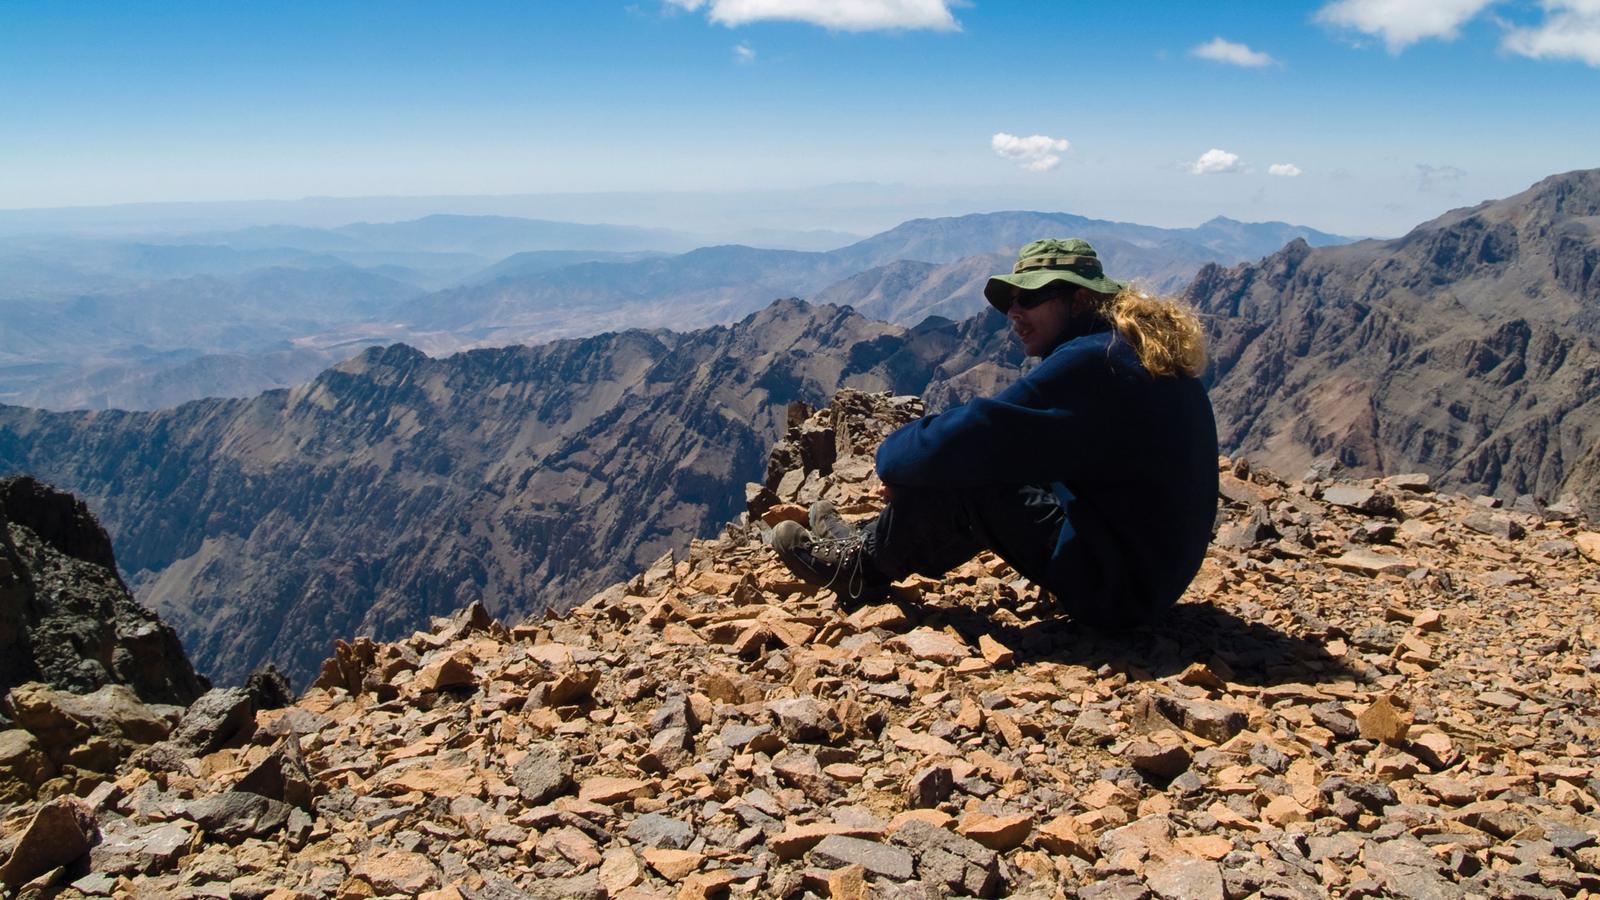 Climb Mt Toubkal. 7 days, Marrakech to Marrakech